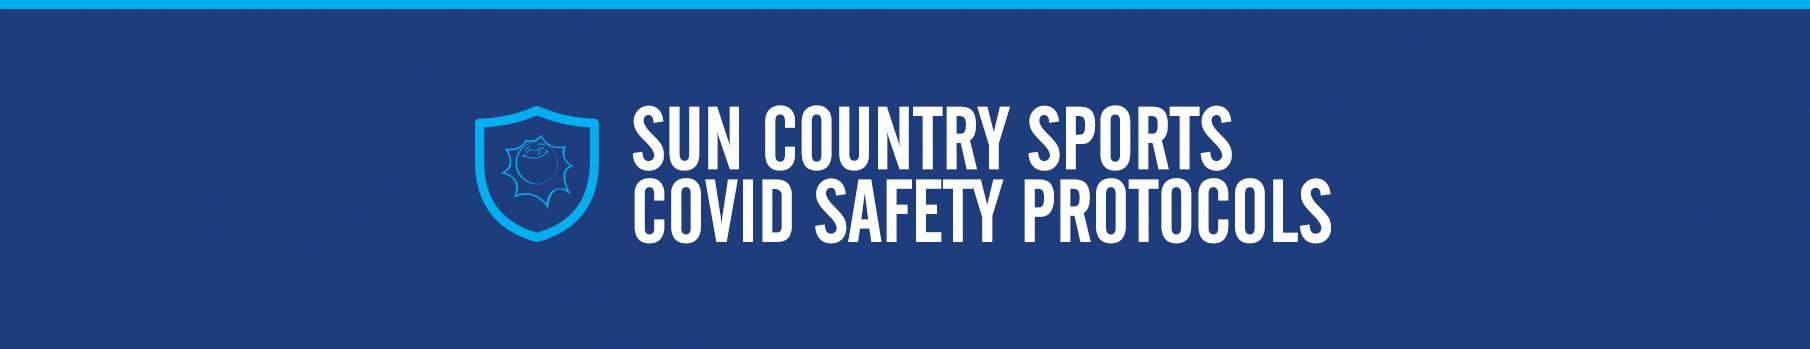 safety-06213